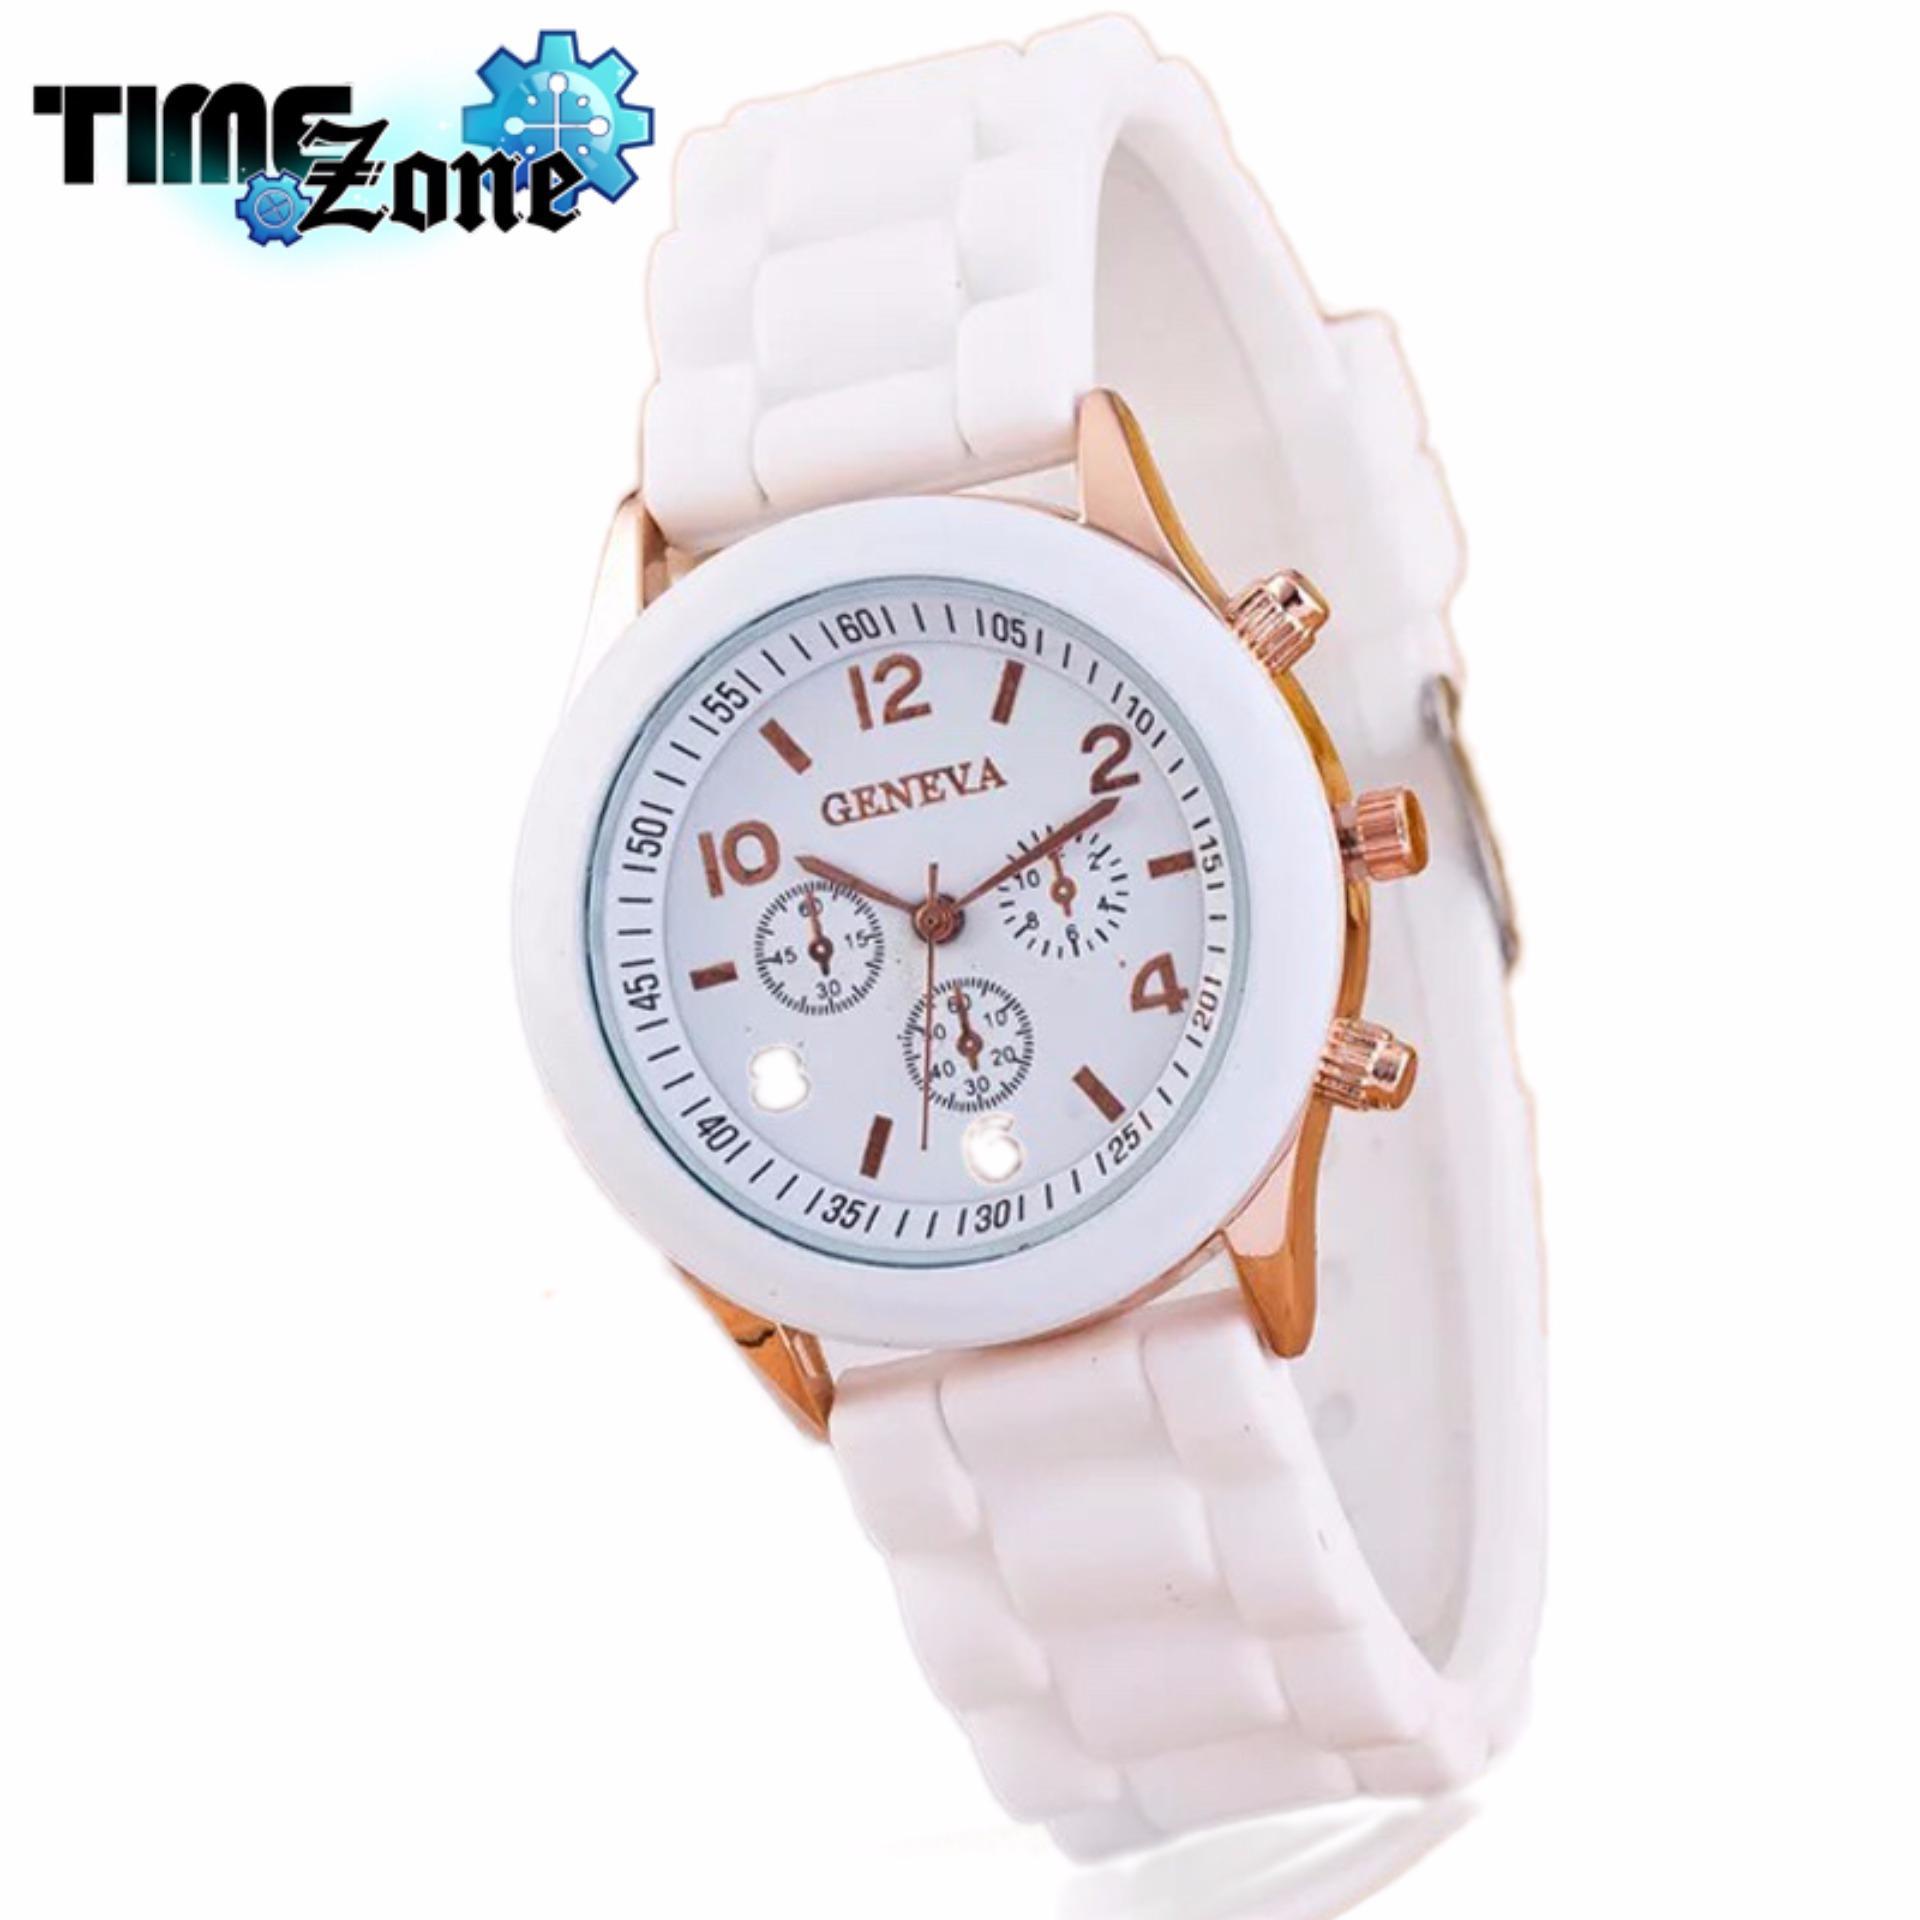 Đồng hồ nữ dây silicon TimeZone Geneva Khởi My (Dây Trắng, Mặt Trắng)